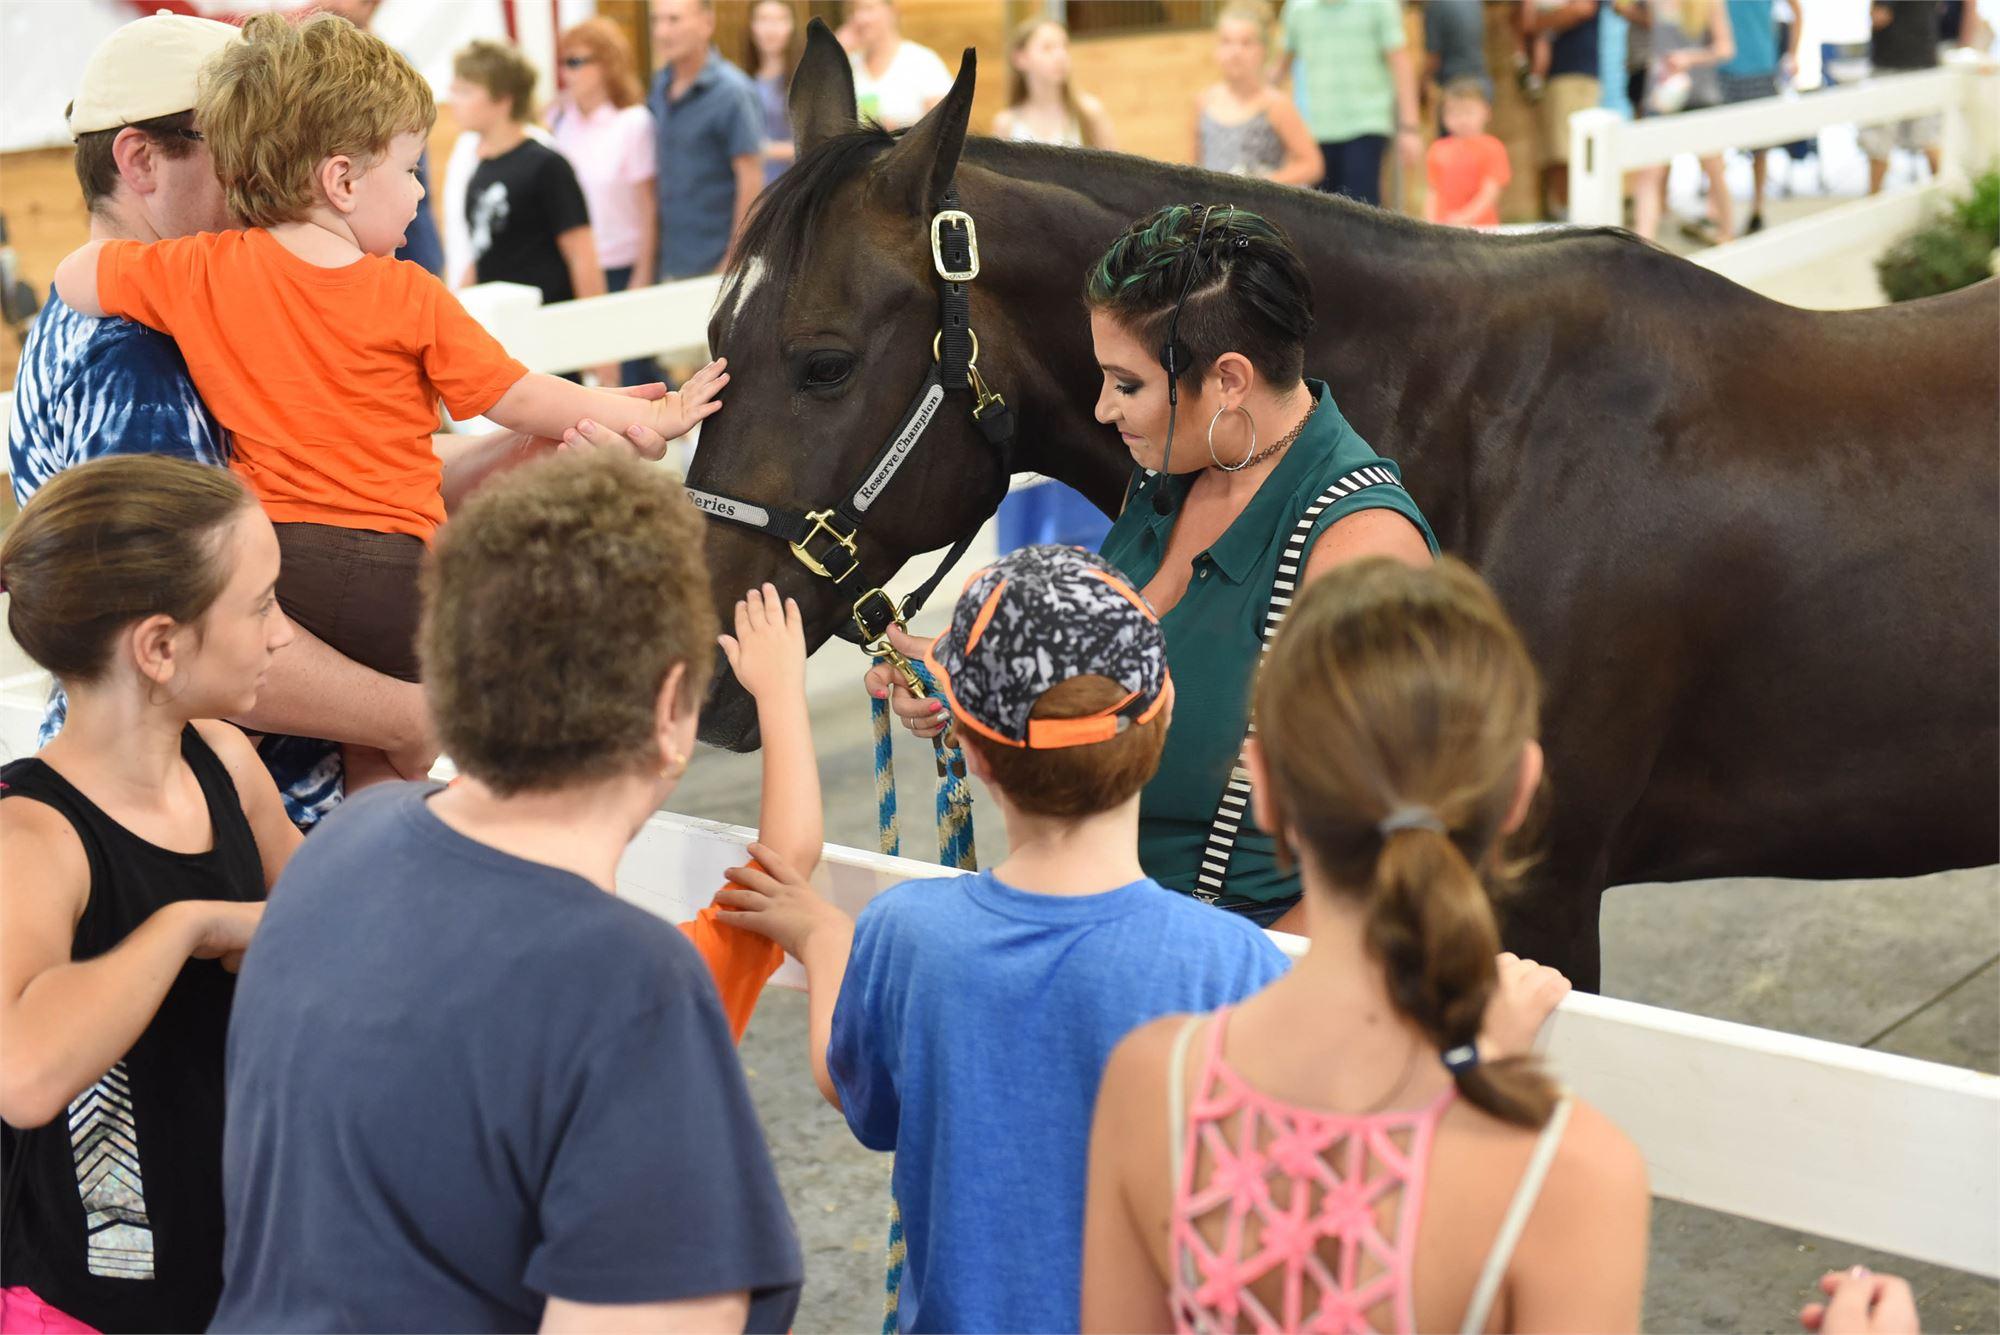 Photo of Fairgoers interacting inside Horse Headquarters